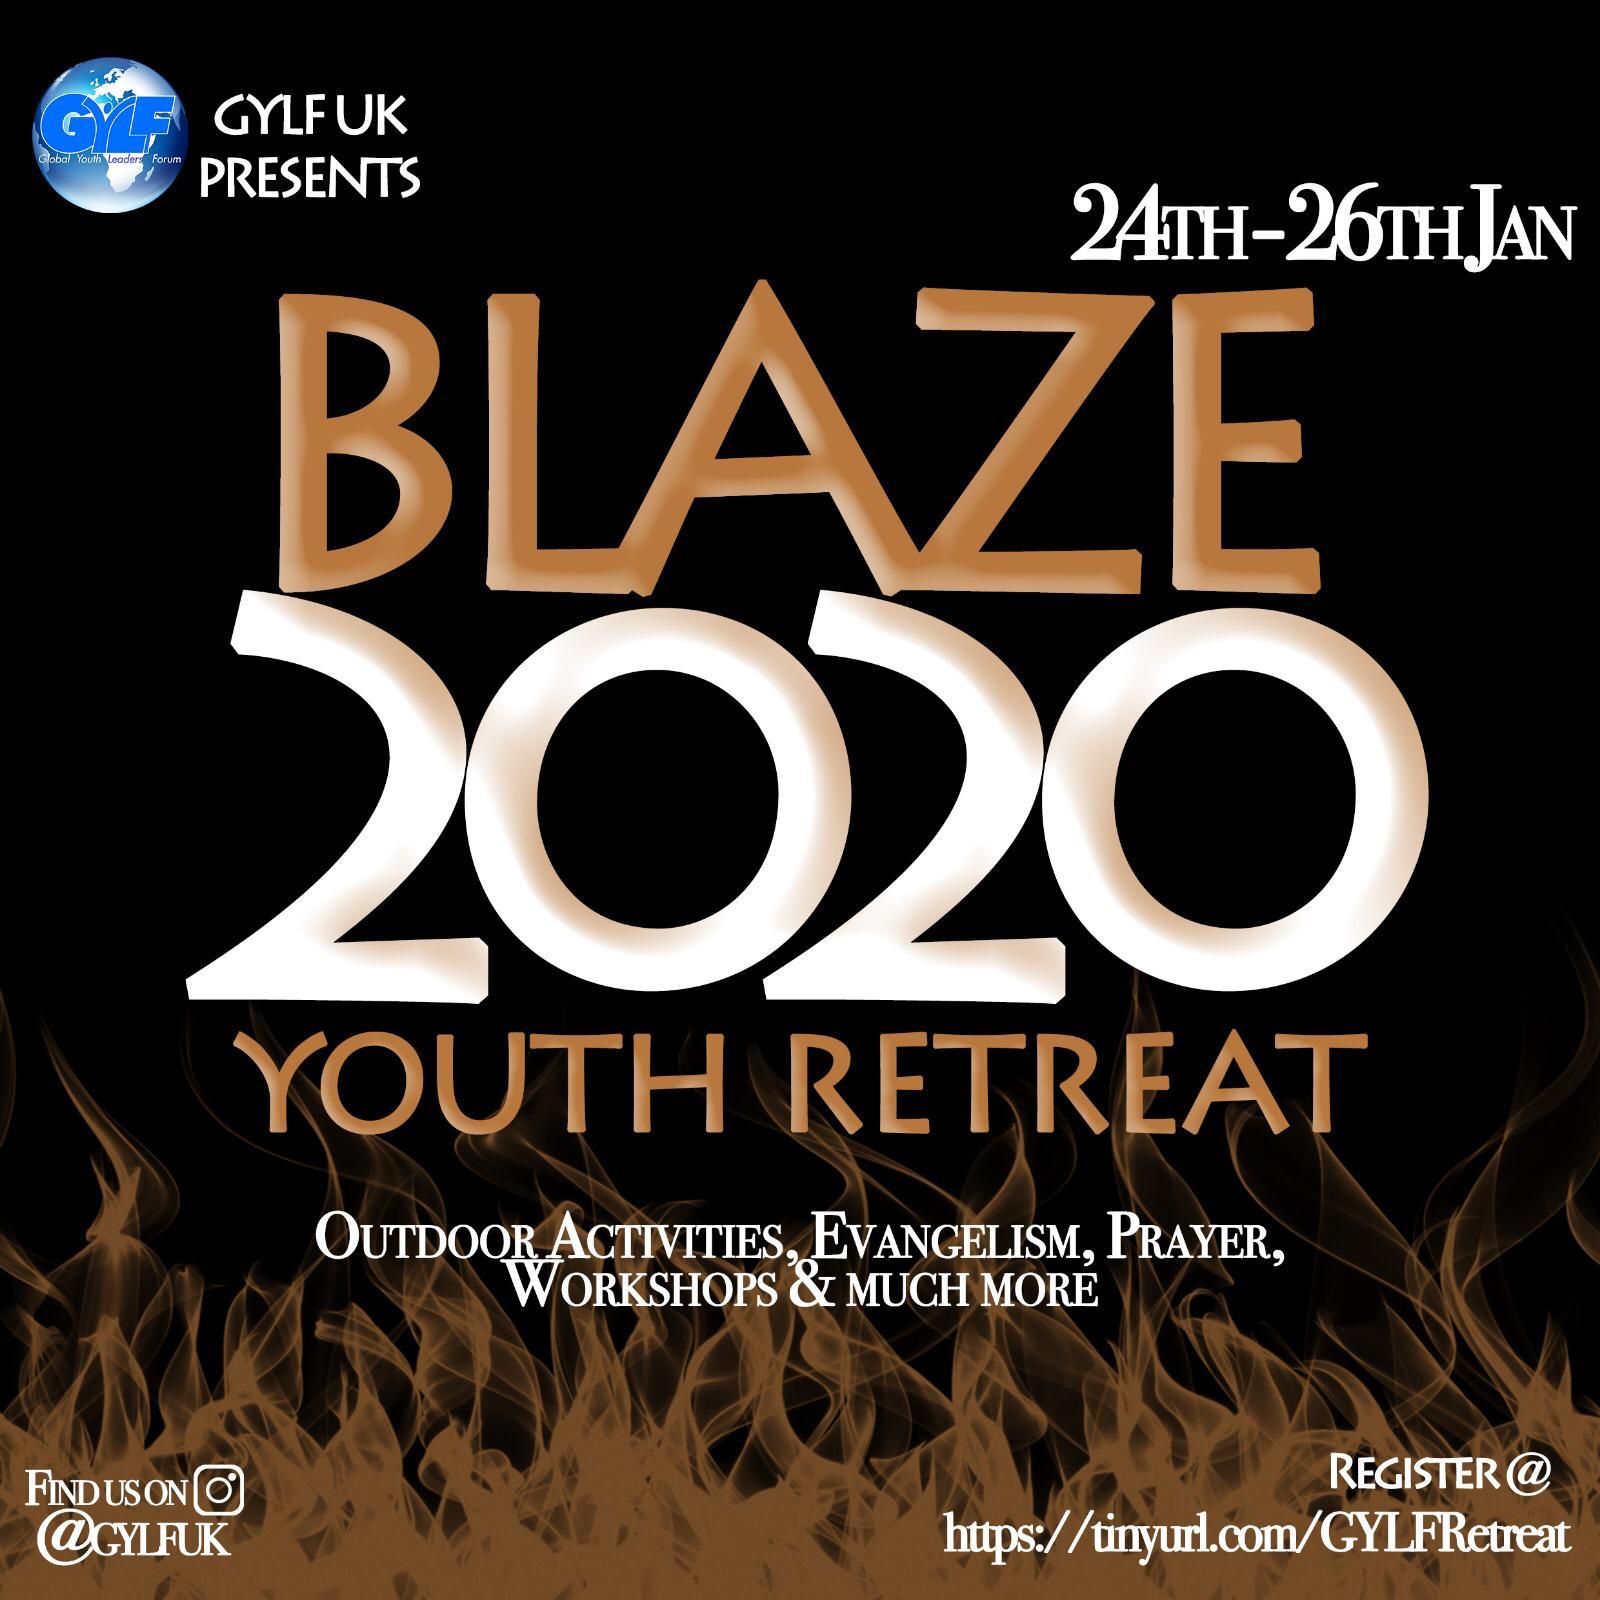 #BLAZE2020